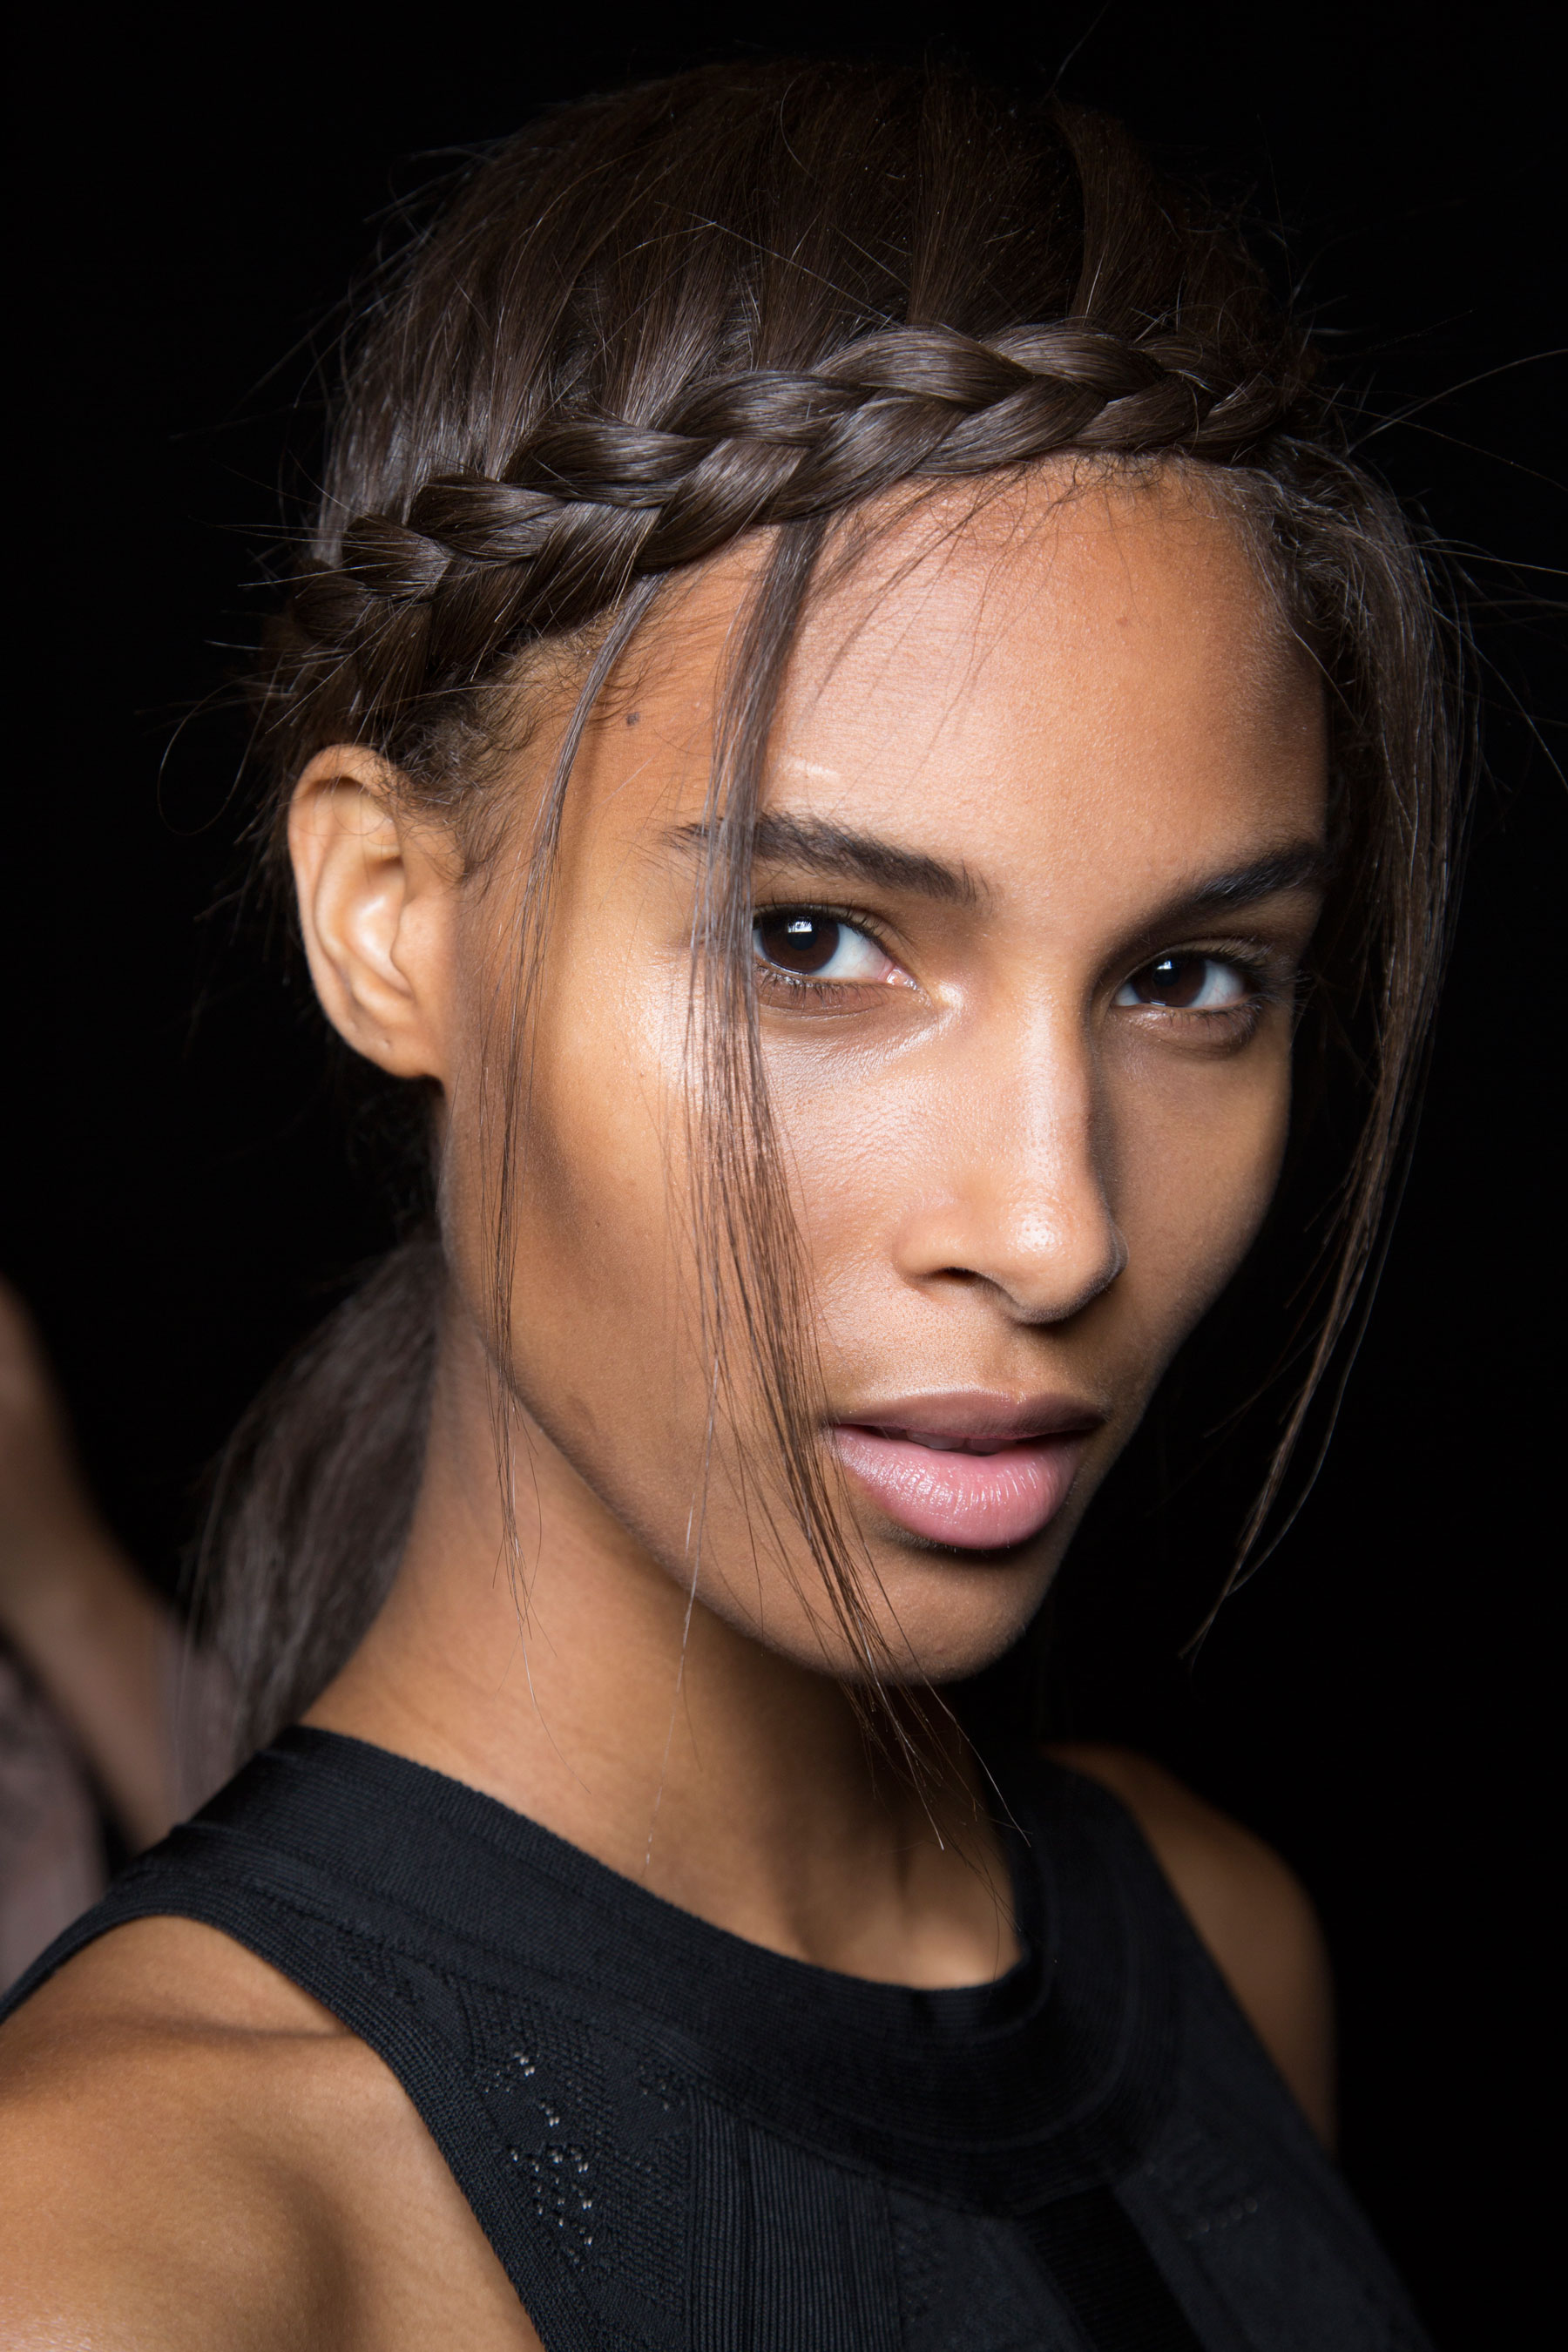 Herve-Leger-backstage-beauty-spring-2016-fashion-show-the-impression-83